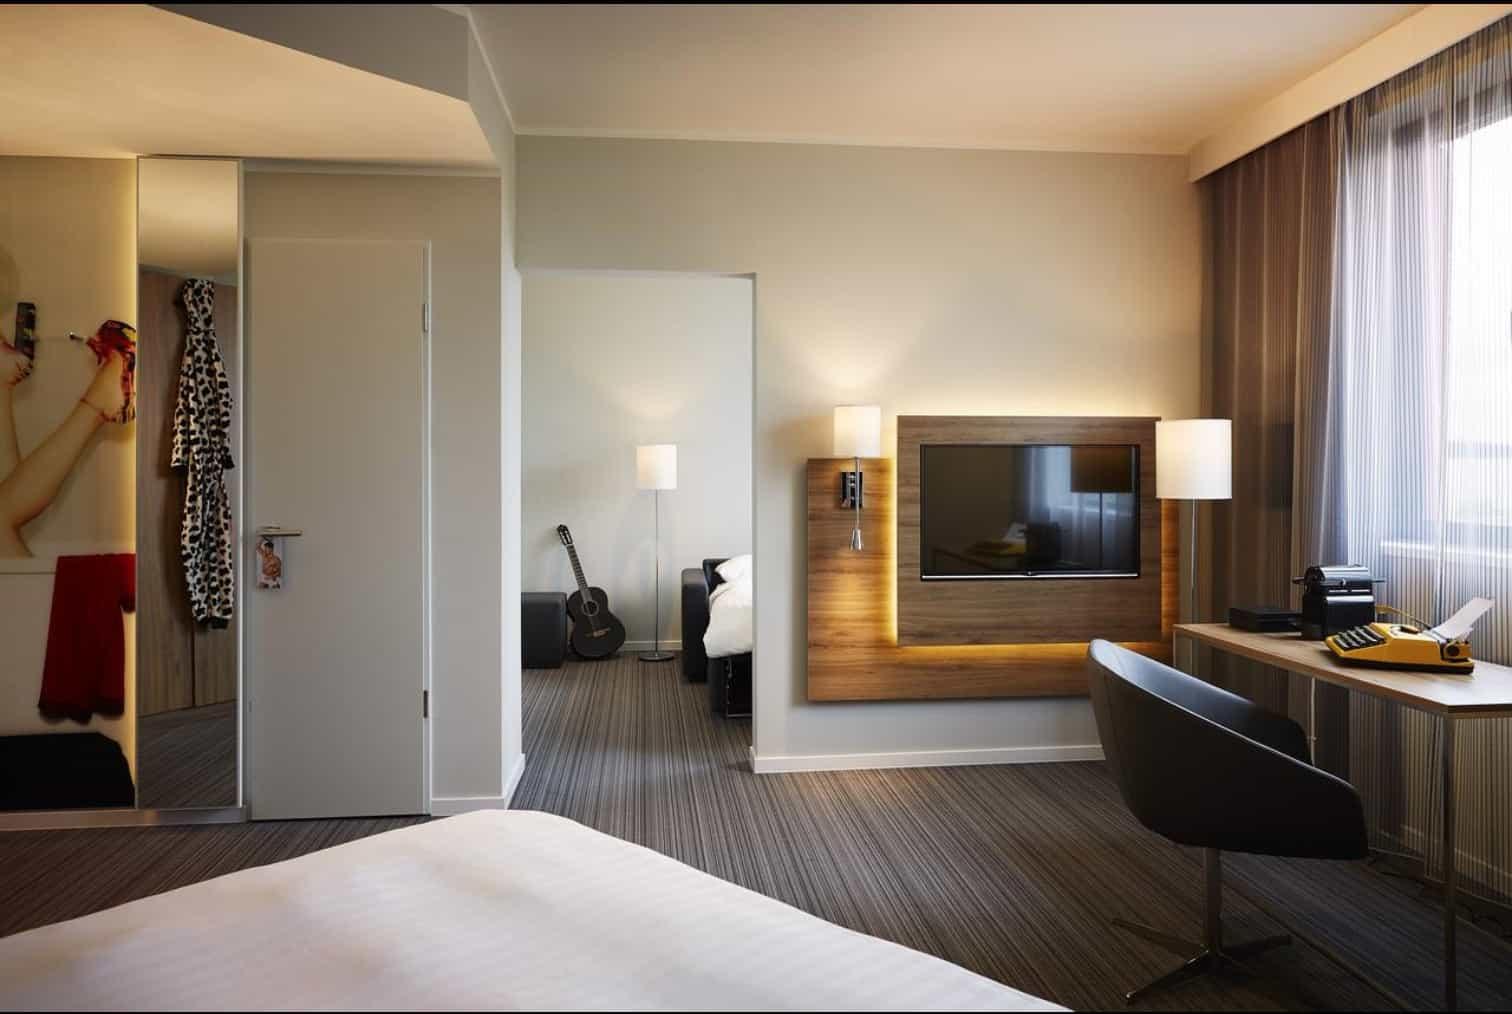 Moxy hotel - a oool hotel Berlin